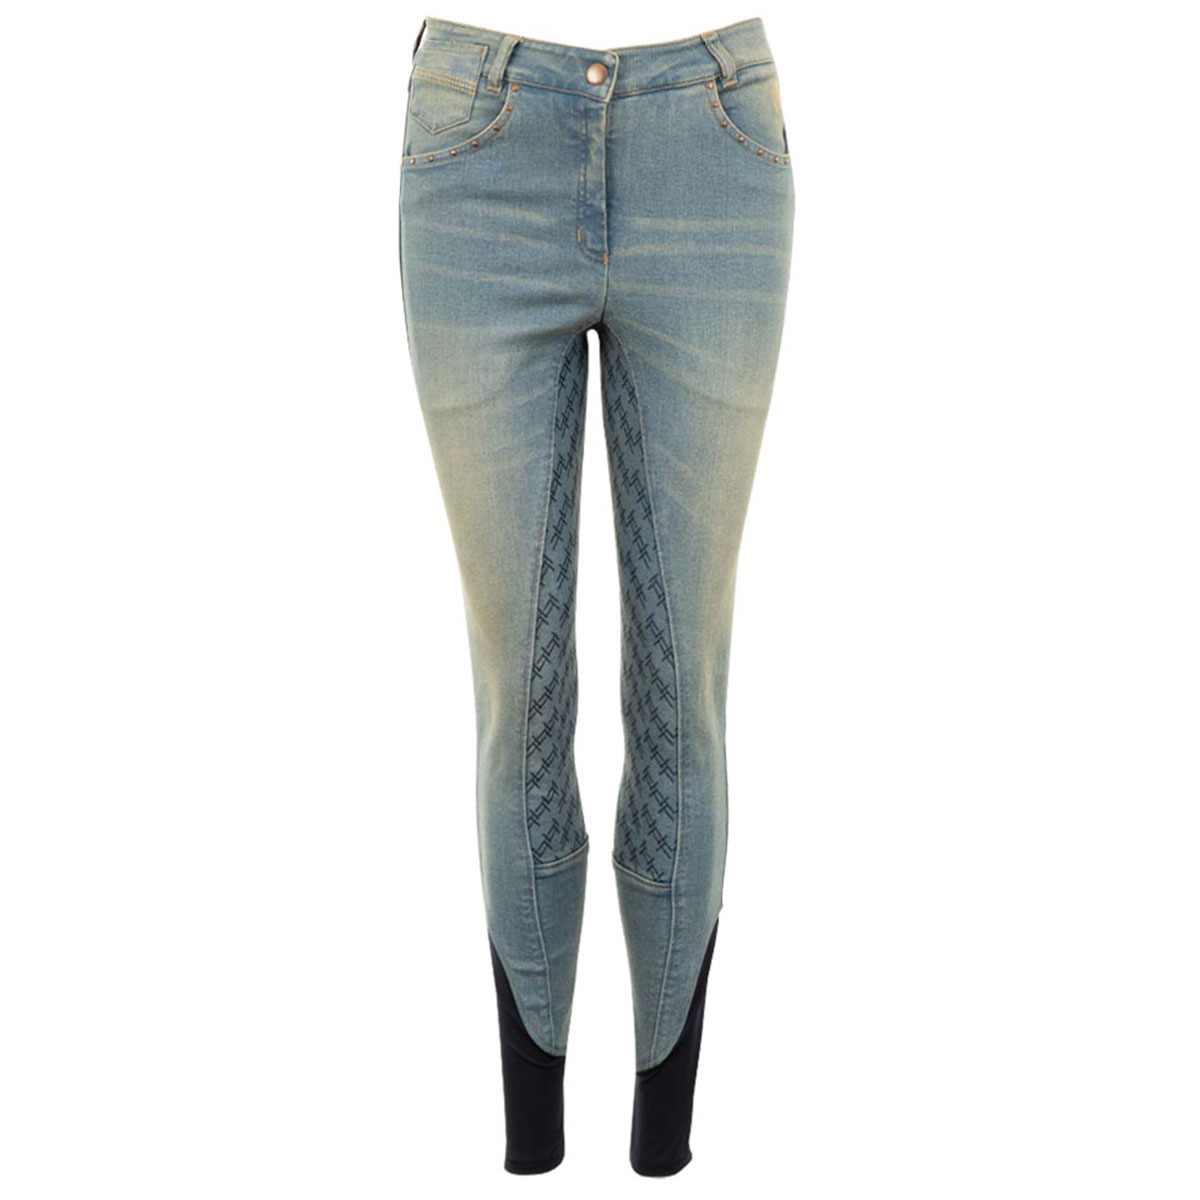 Anky Light Denim FG jeans rijbroek jeans maat:38